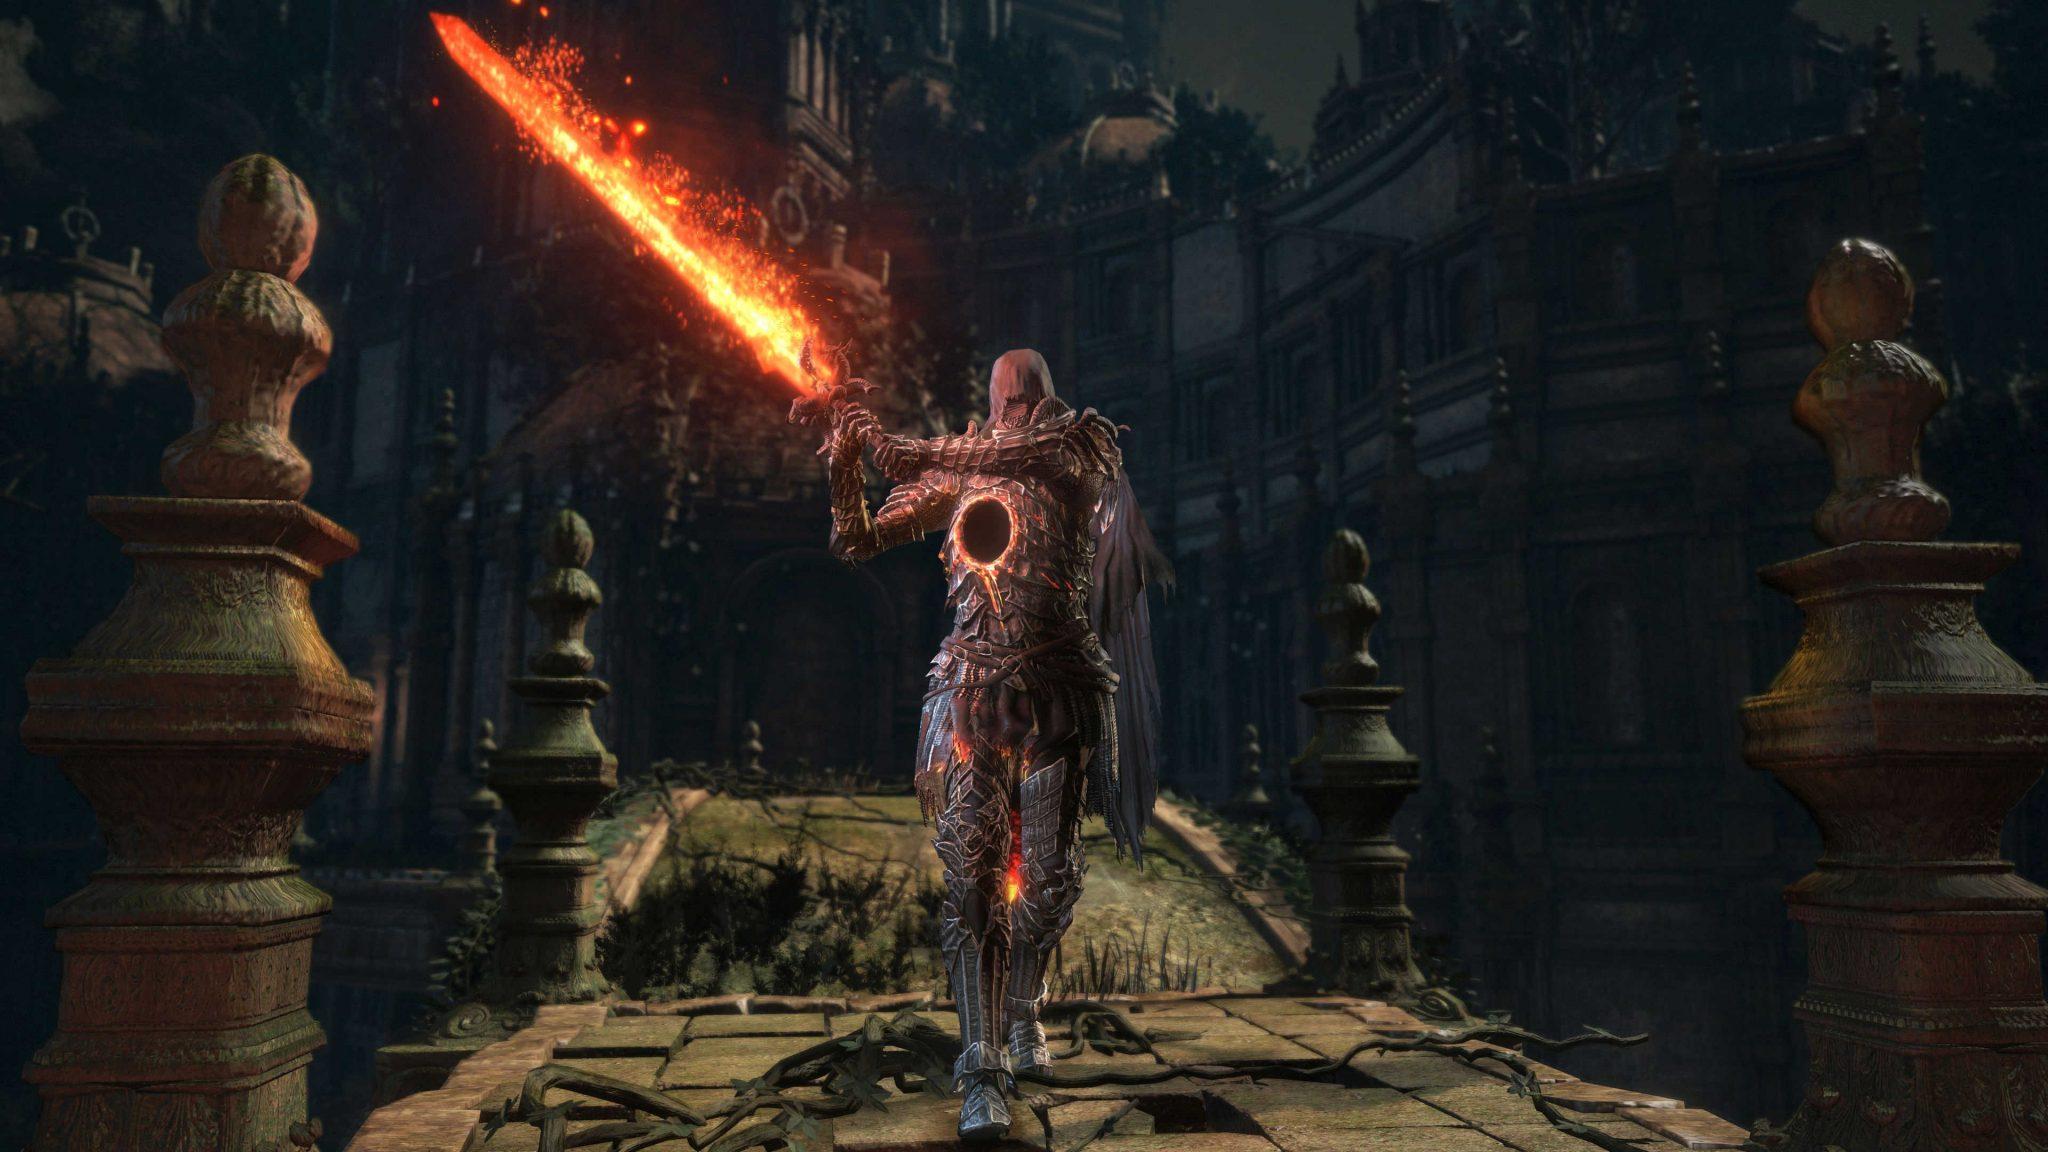 dark-souls-3-patch-1-14-ya-esta-disponible-todas-las-plataformas-frikigamers.com